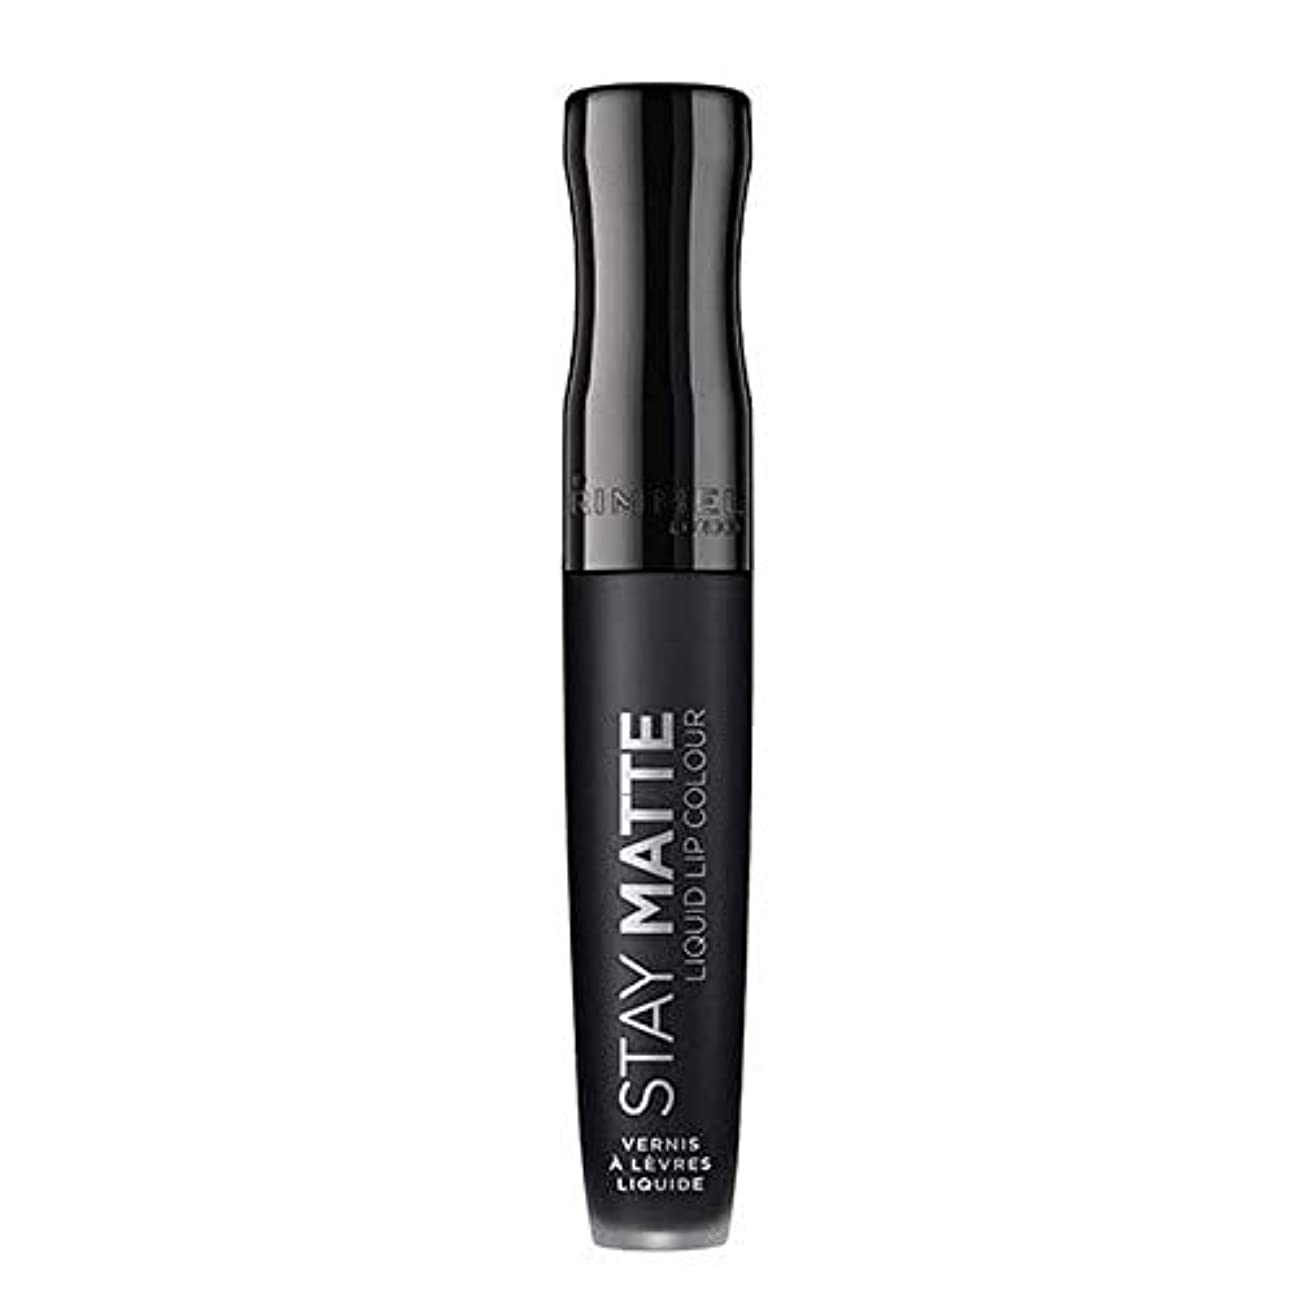 [Rimmel ] リンメルステイマット液状口紅ピッチ黒840 - Rimmel Stay Matte Liquid Lipstick Pitch Black 840 [並行輸入品]